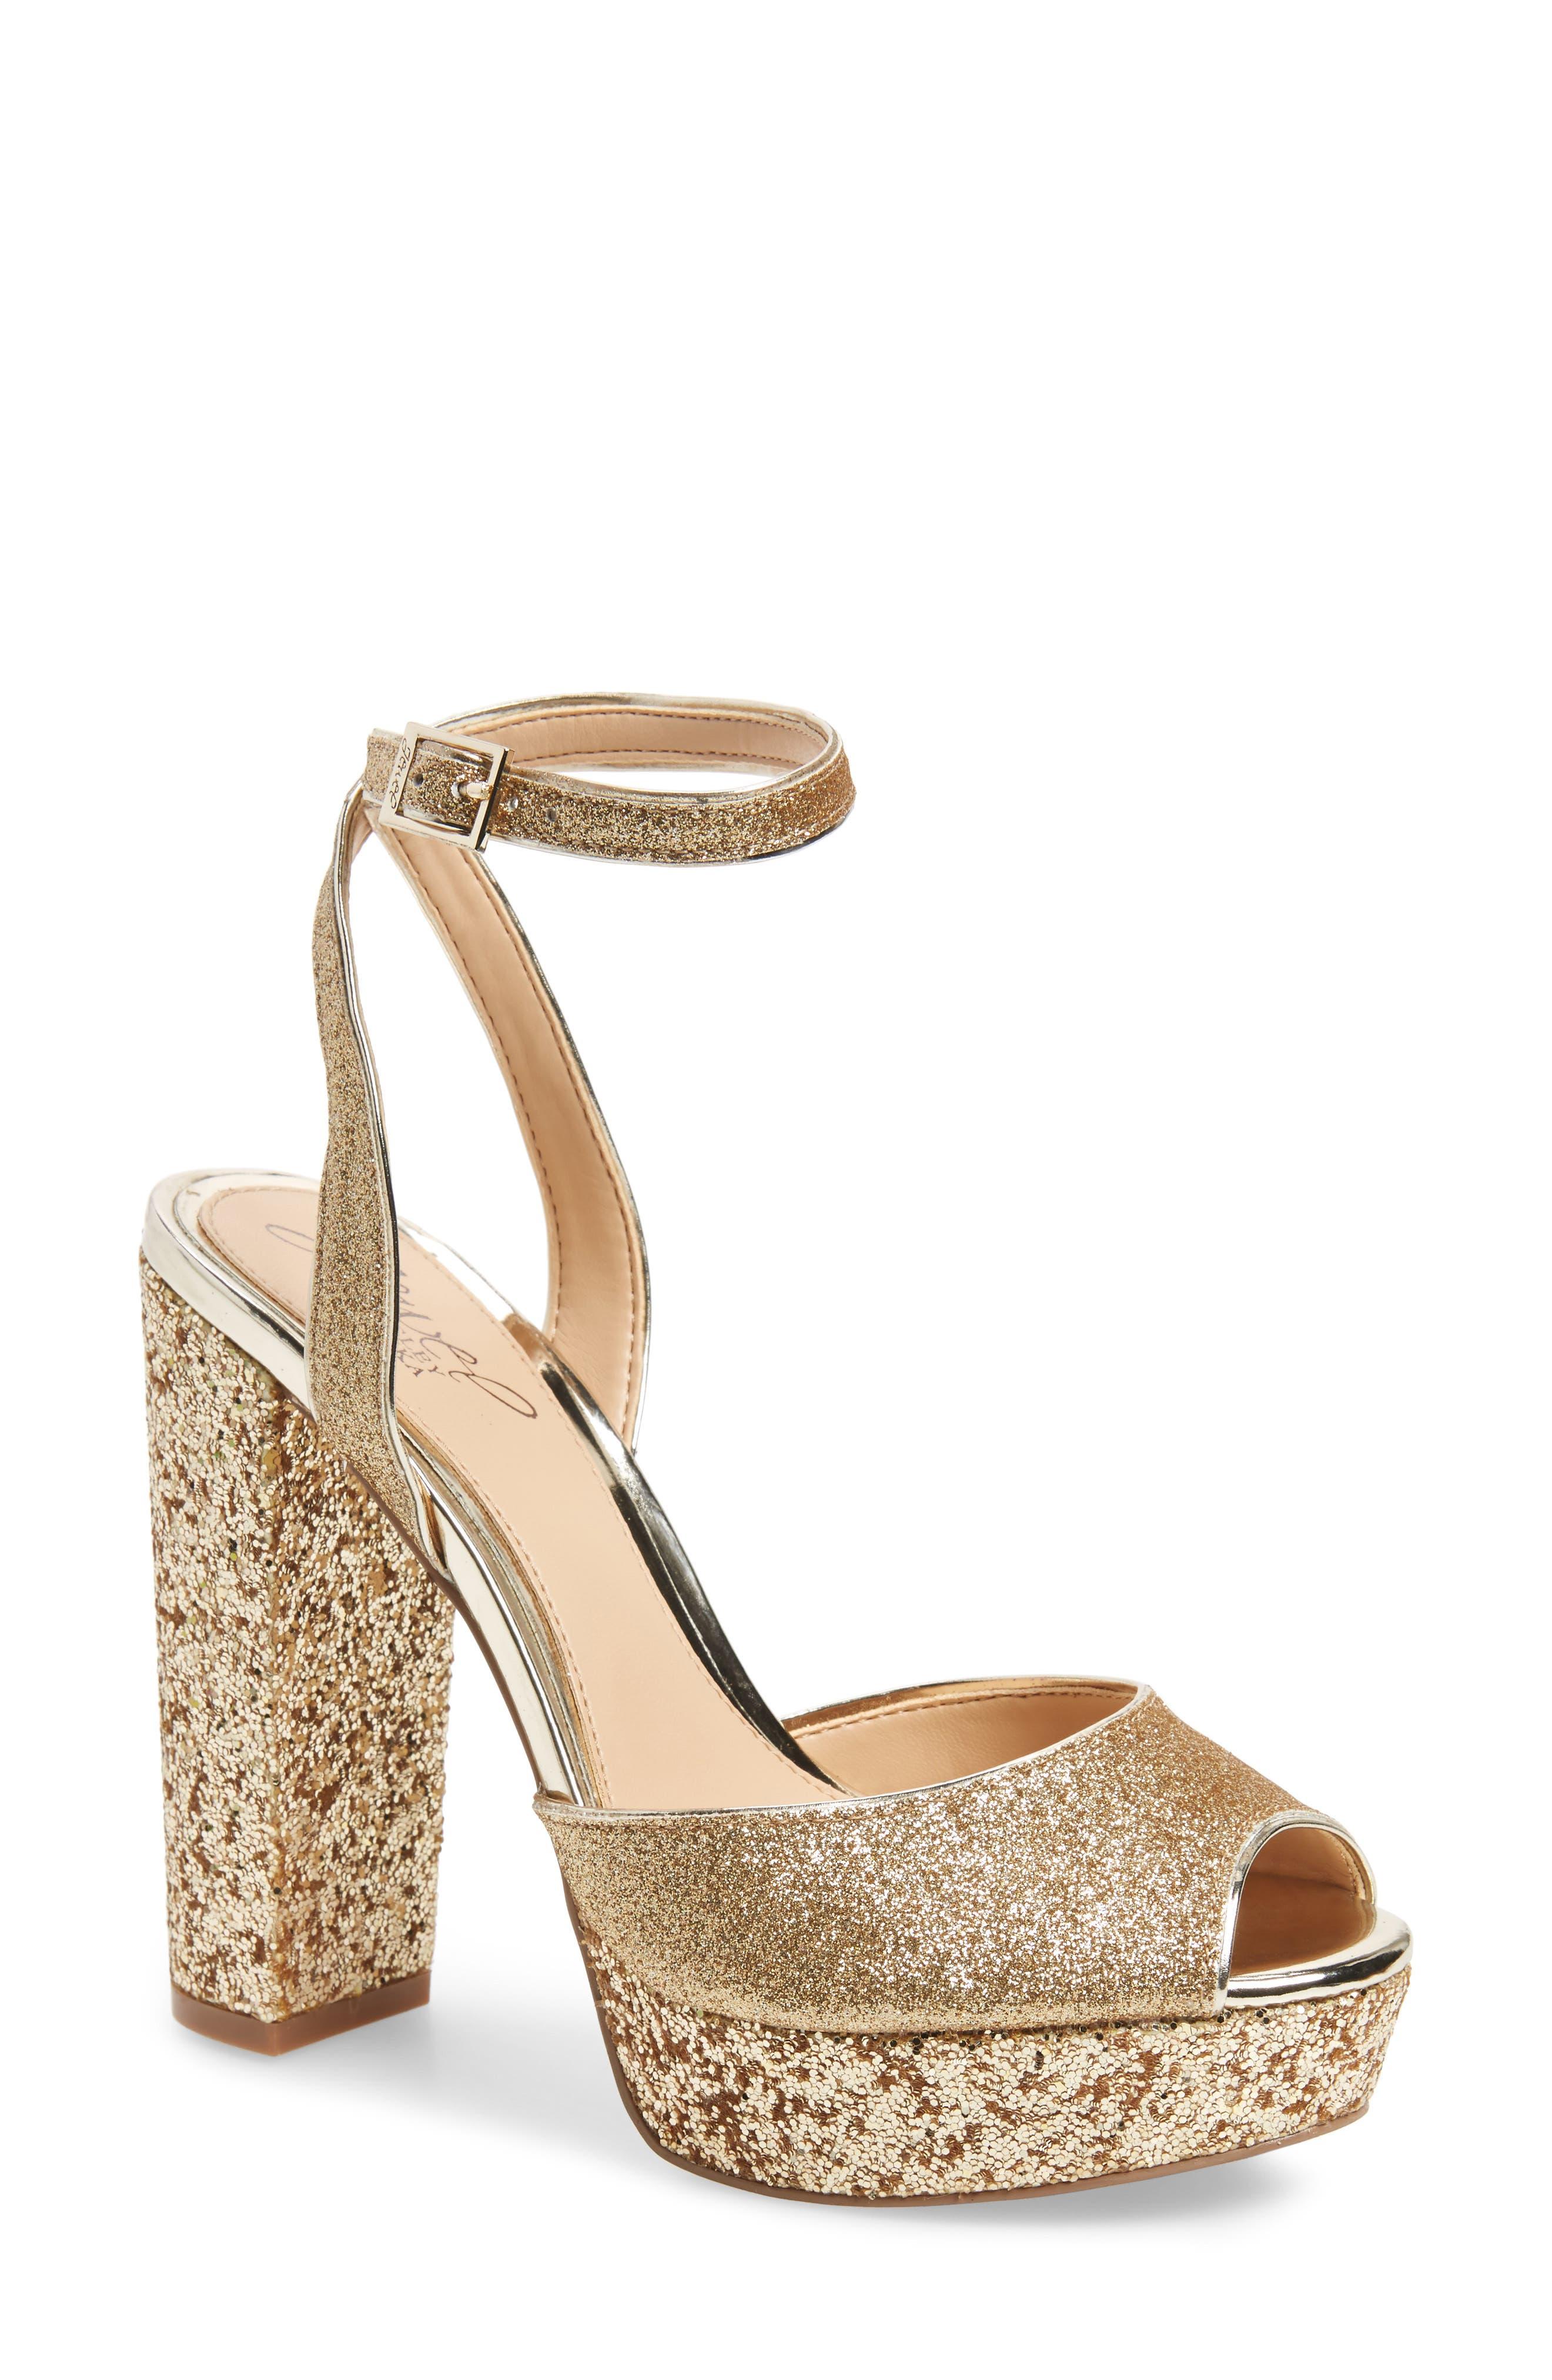 Main Image - Jewel Badgley Mischka Luke Platform Sandal (Women)